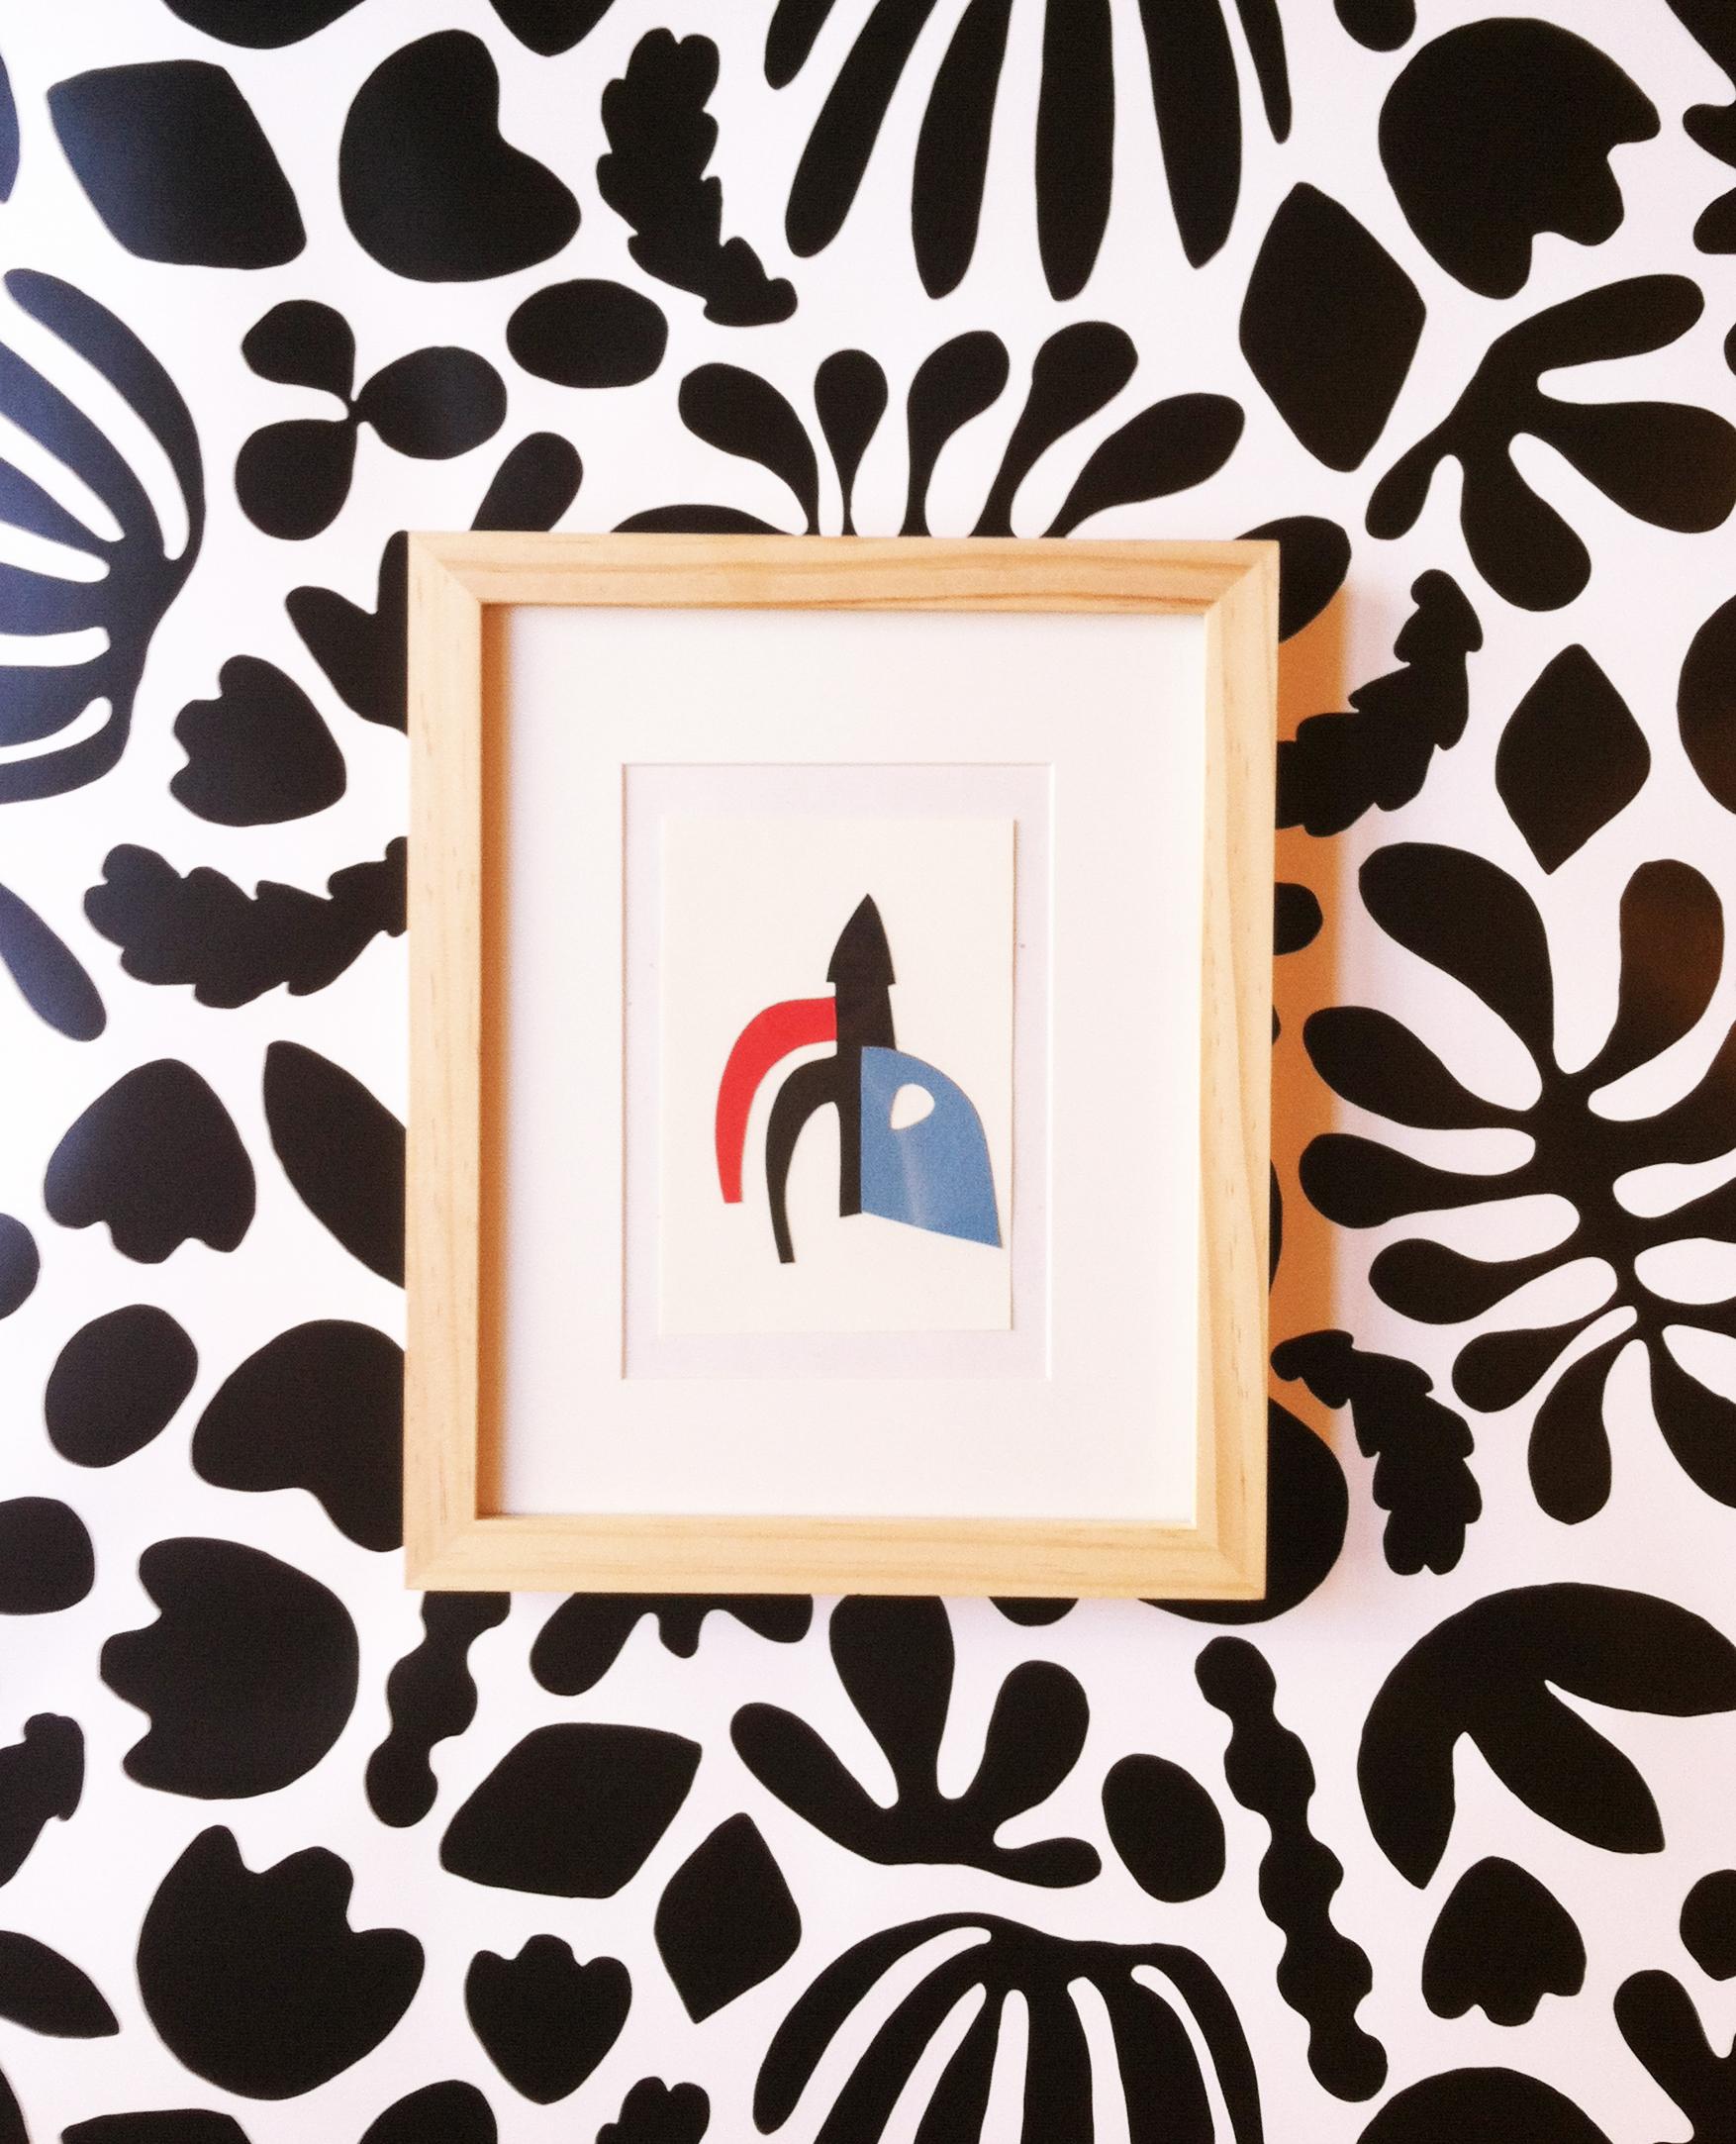 Matisse Noir by Kate Zaremba 2015